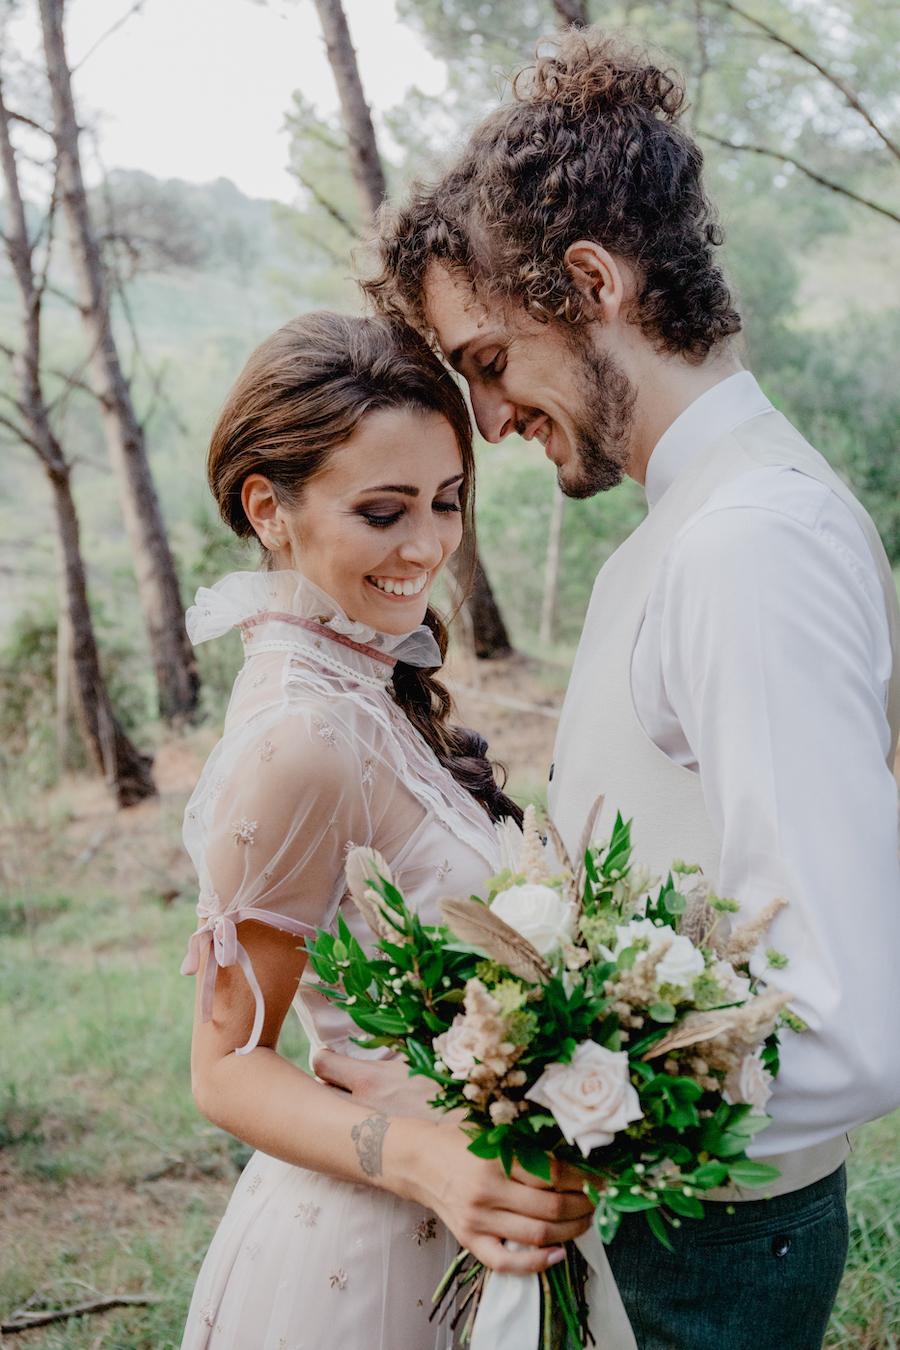 matrimonio-a-tema-stelle-in-pineta-federica-cosentino-26.jpg